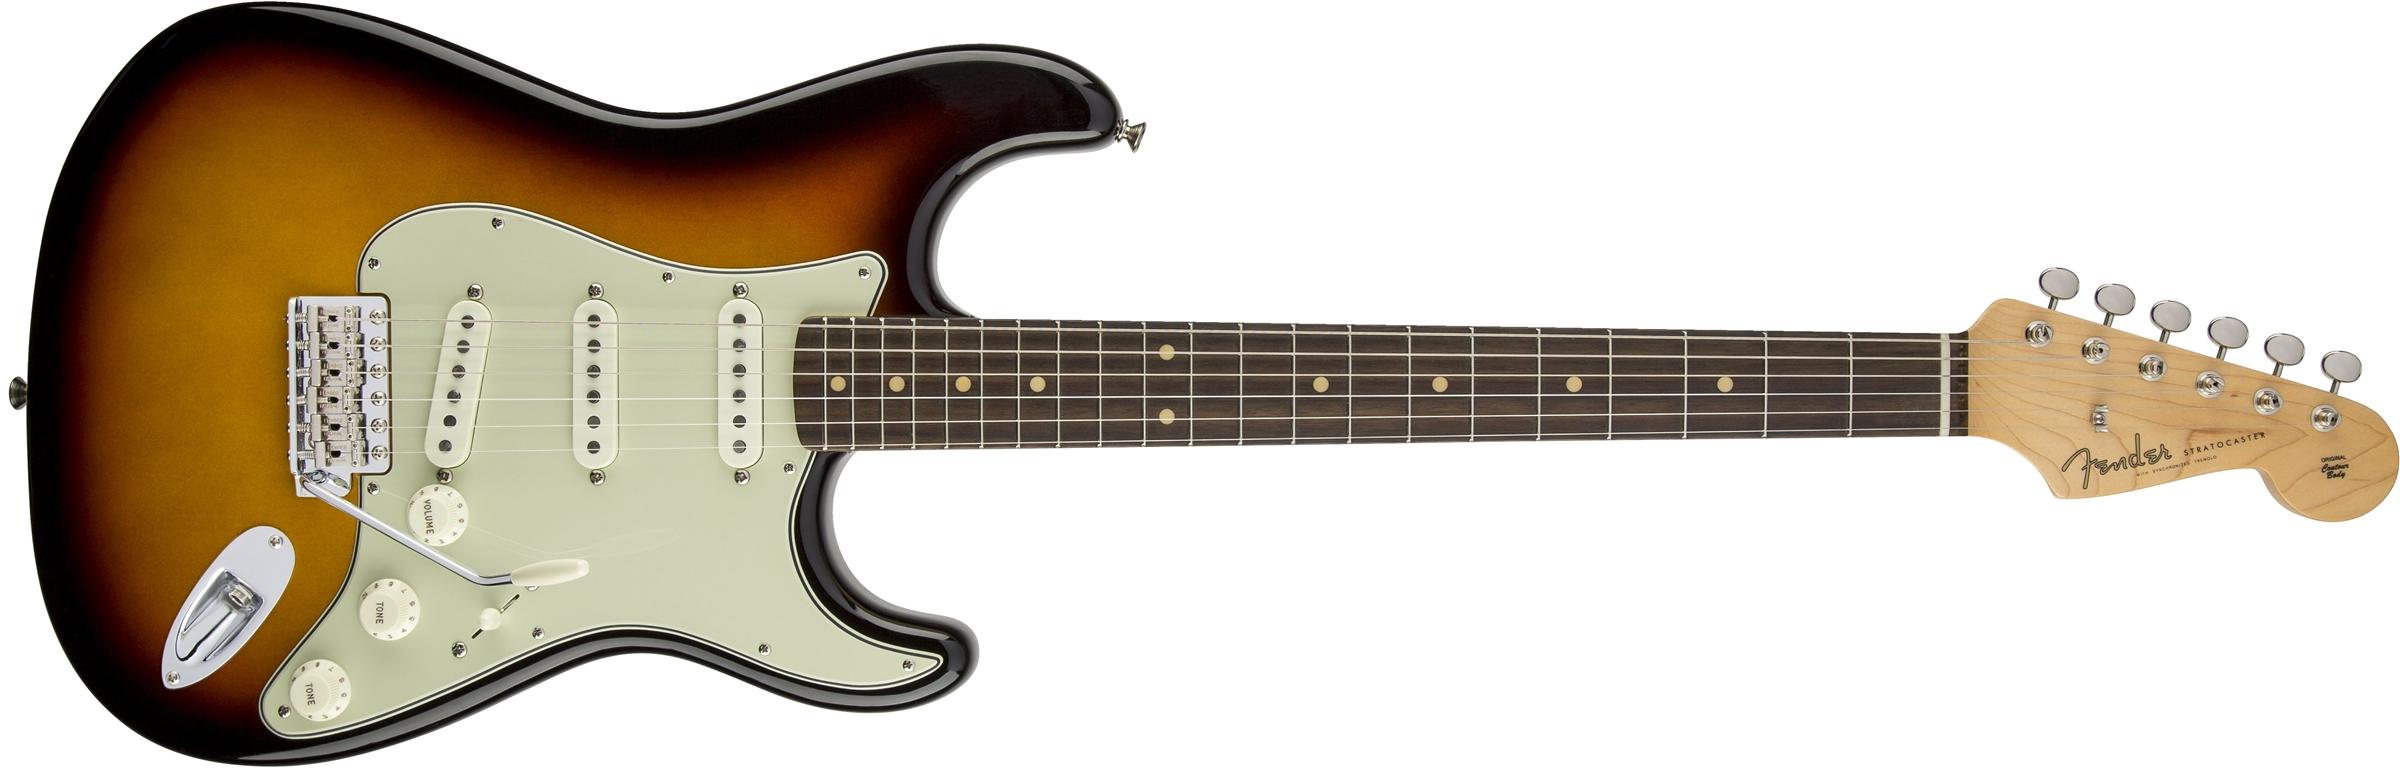 9 – Stratocaster